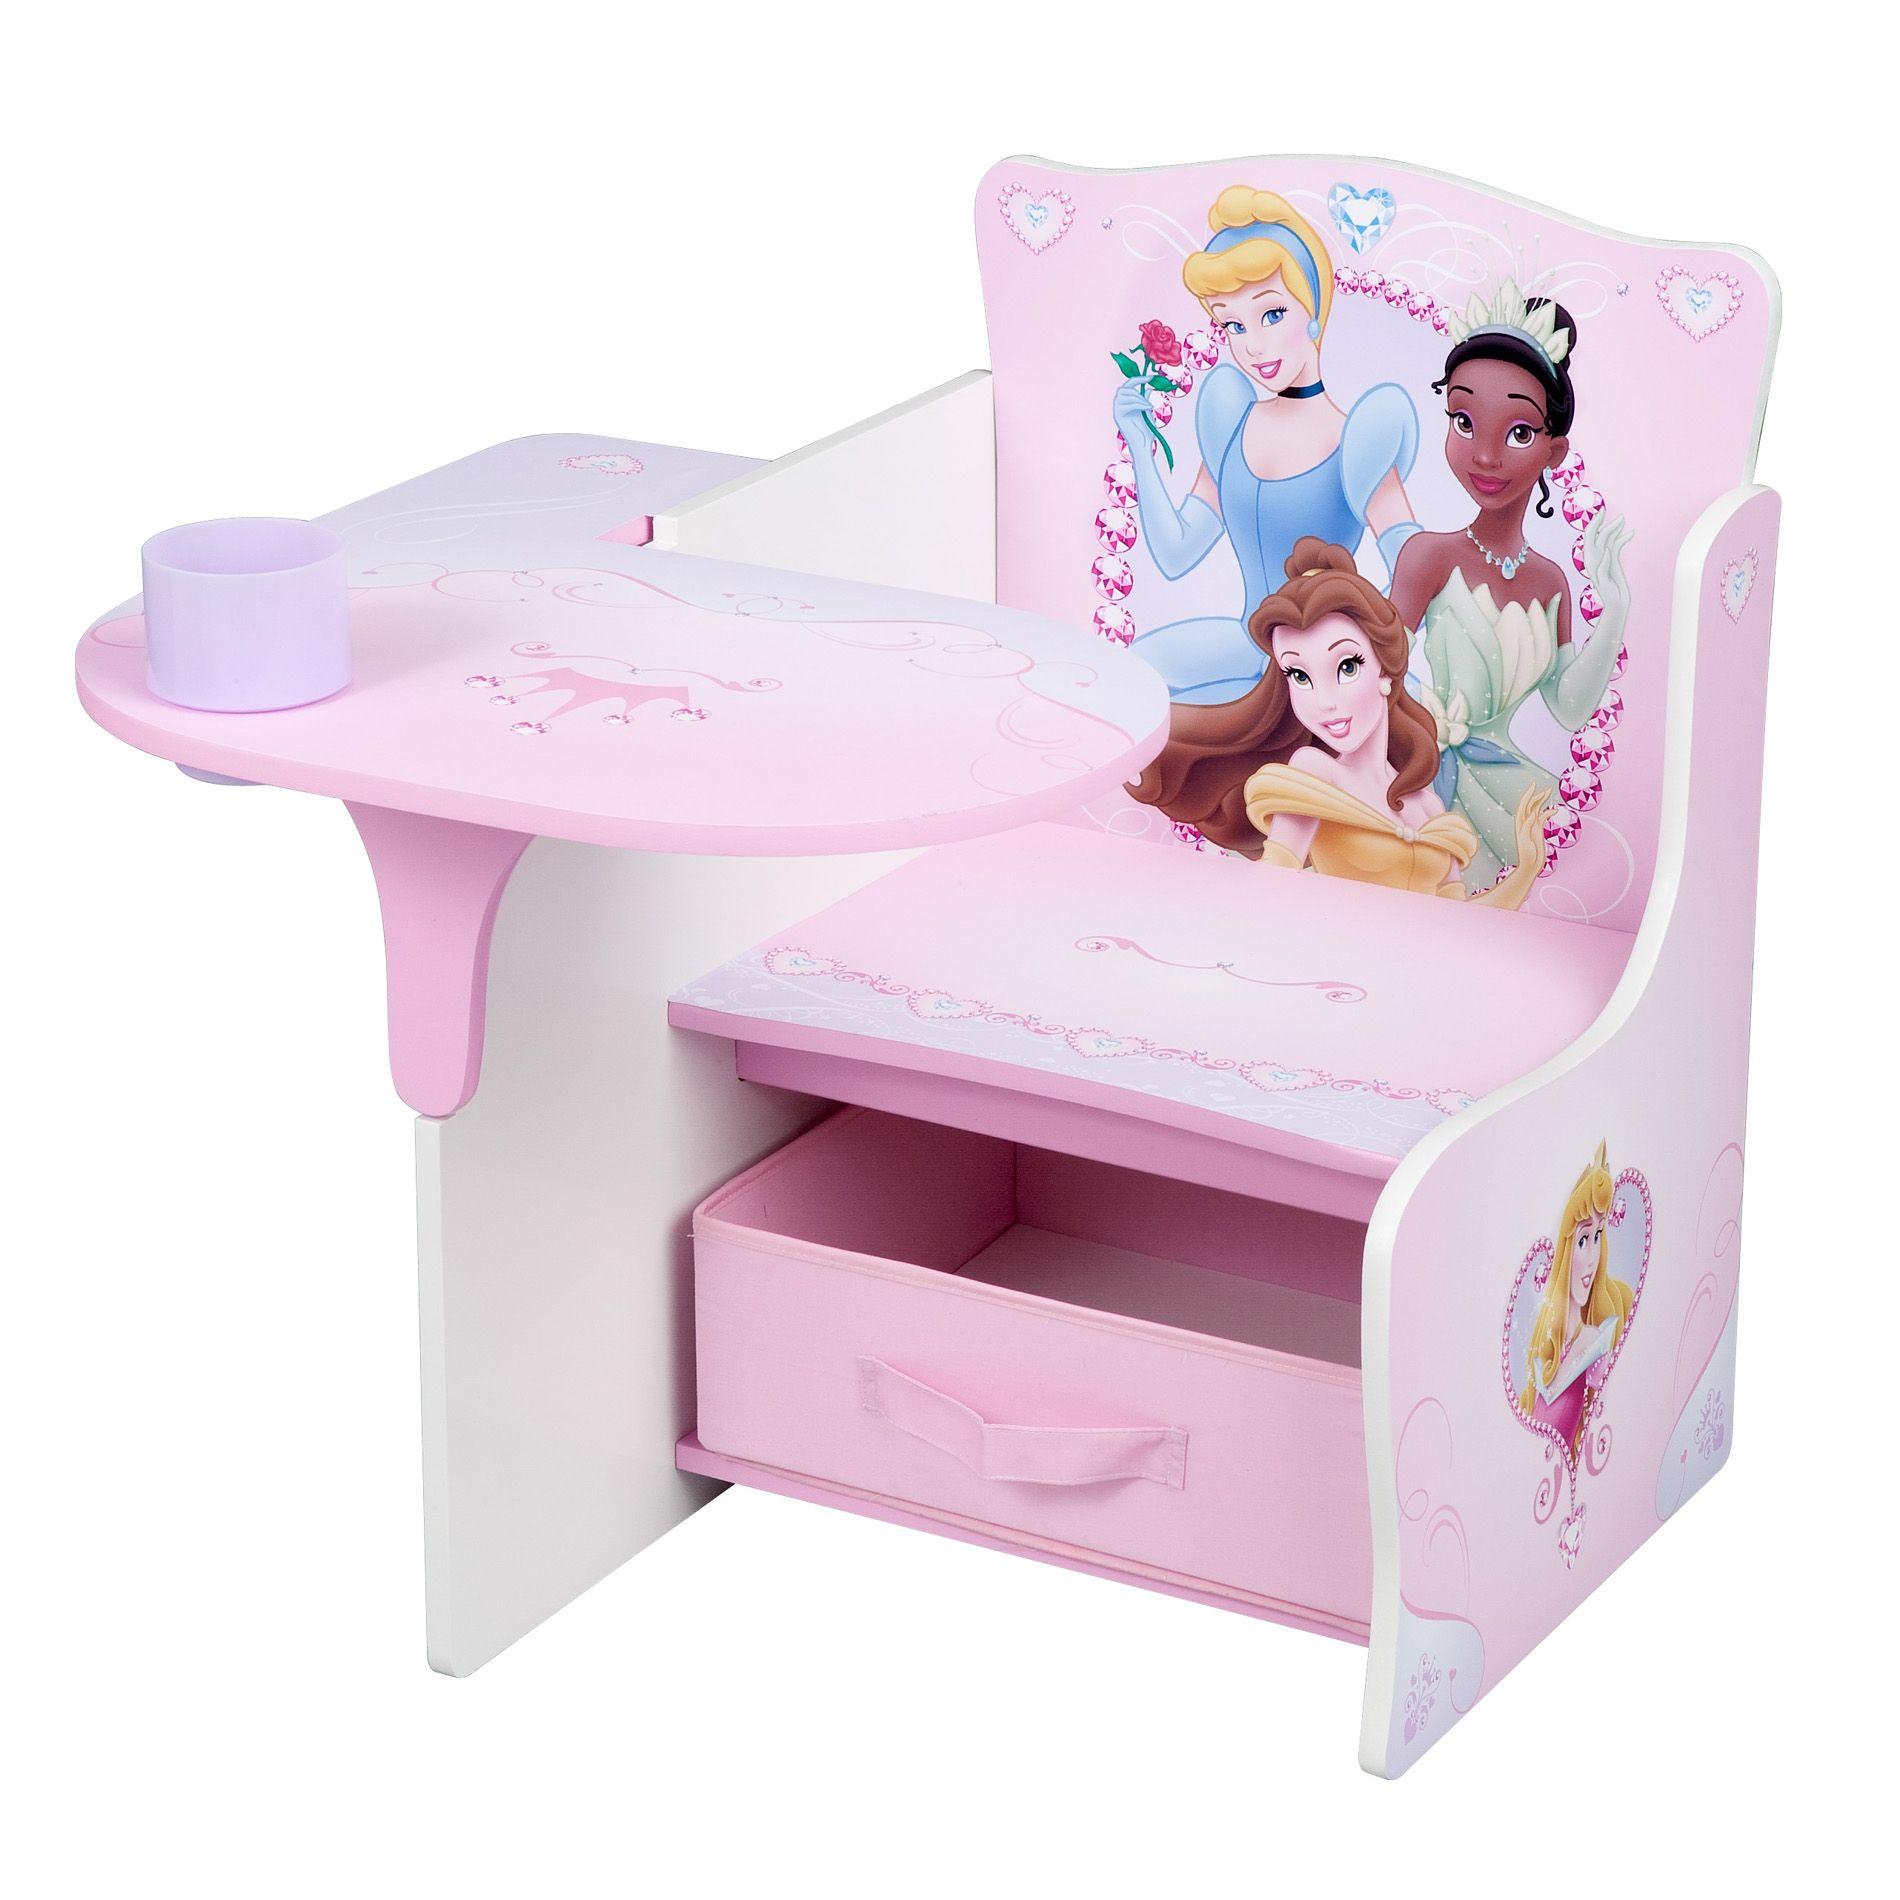 disney princess chair batman table and chairs tiana princesses my 1st desk